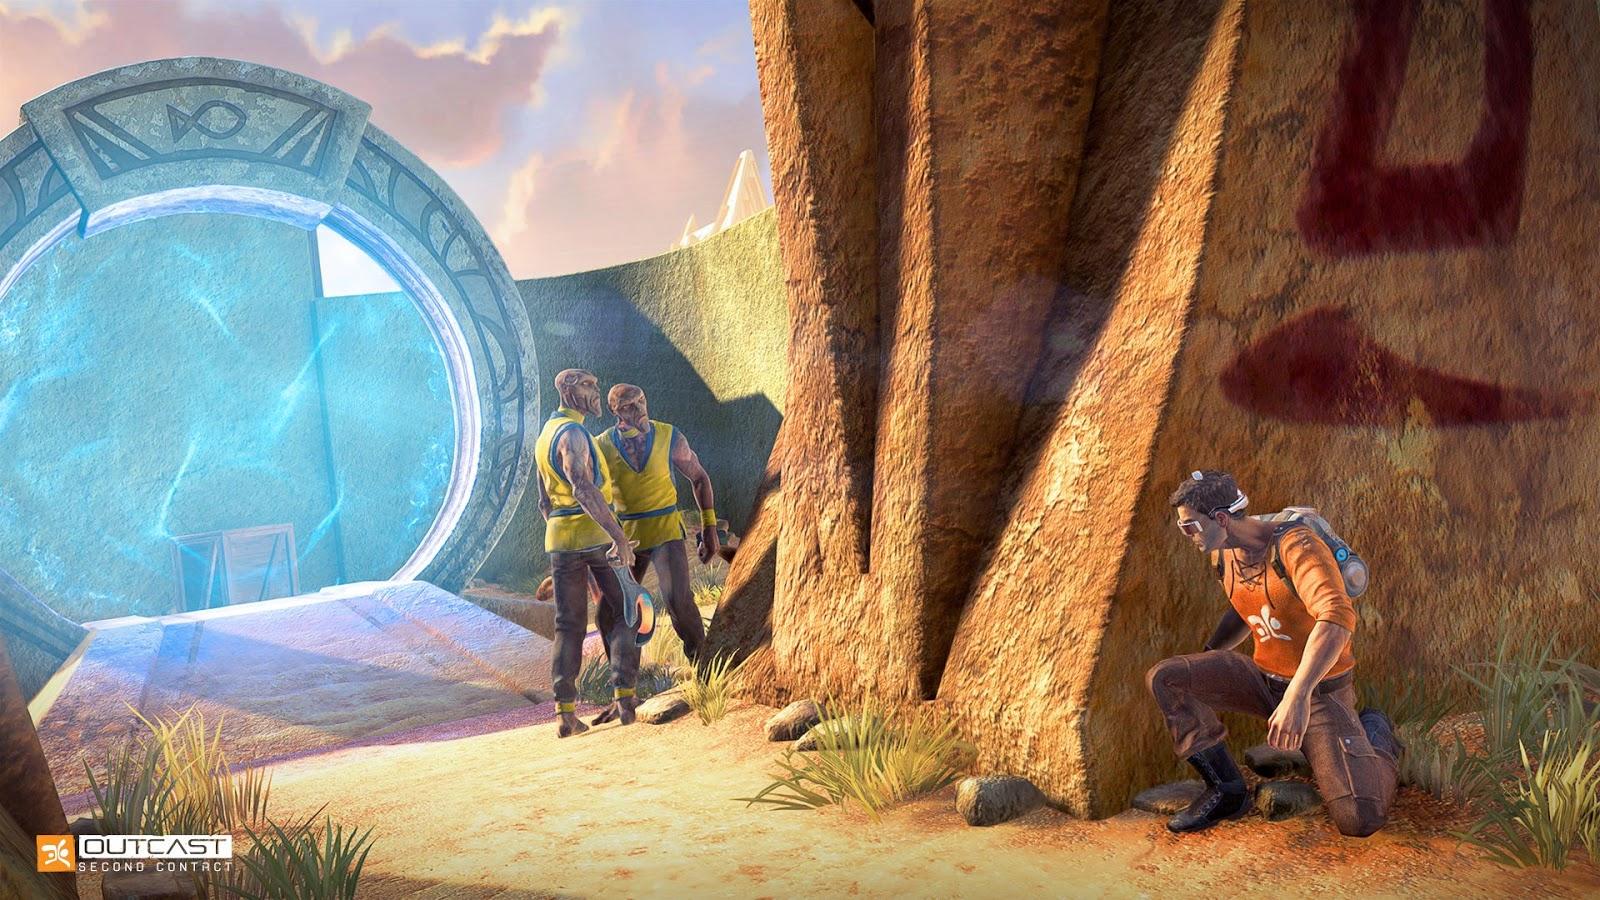 Outcast - Second Contact, Outcast Remake, Outcast, Indie Game, Sci Fi, фантастика, ремейк, независимая игра, инди-игра